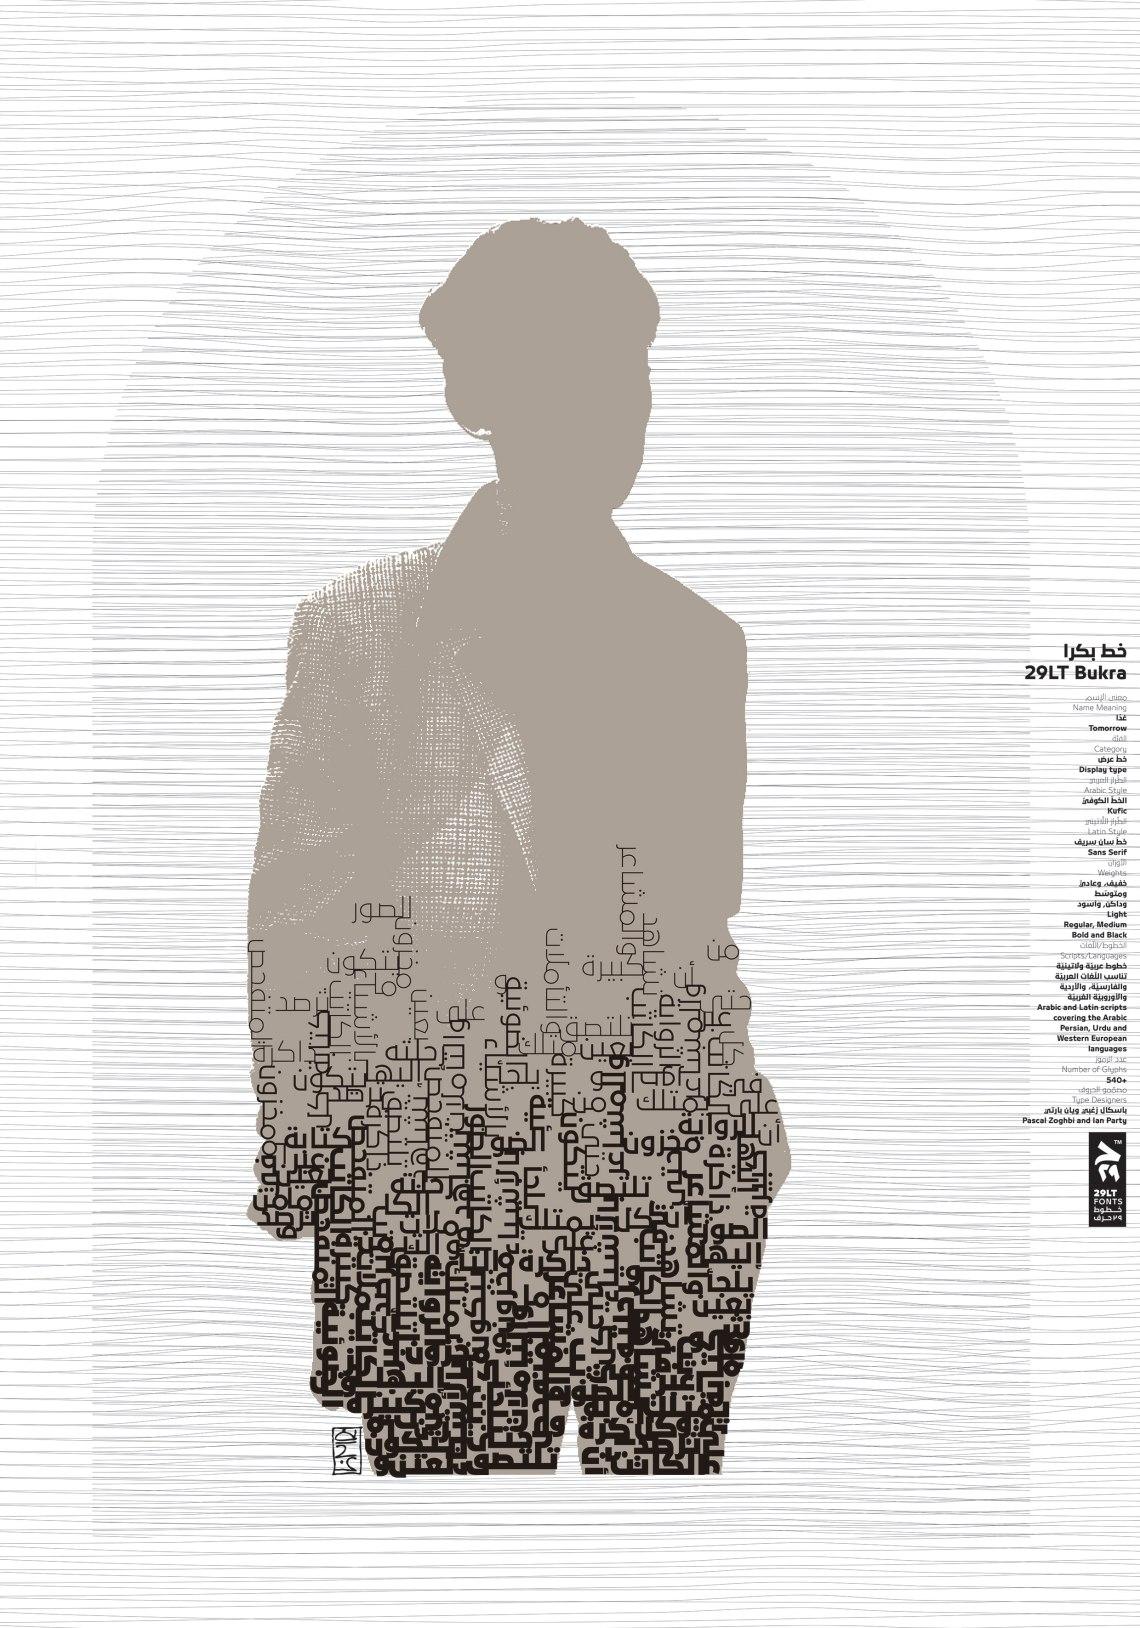 29LT Bukra Poster designed by Reza Abedini